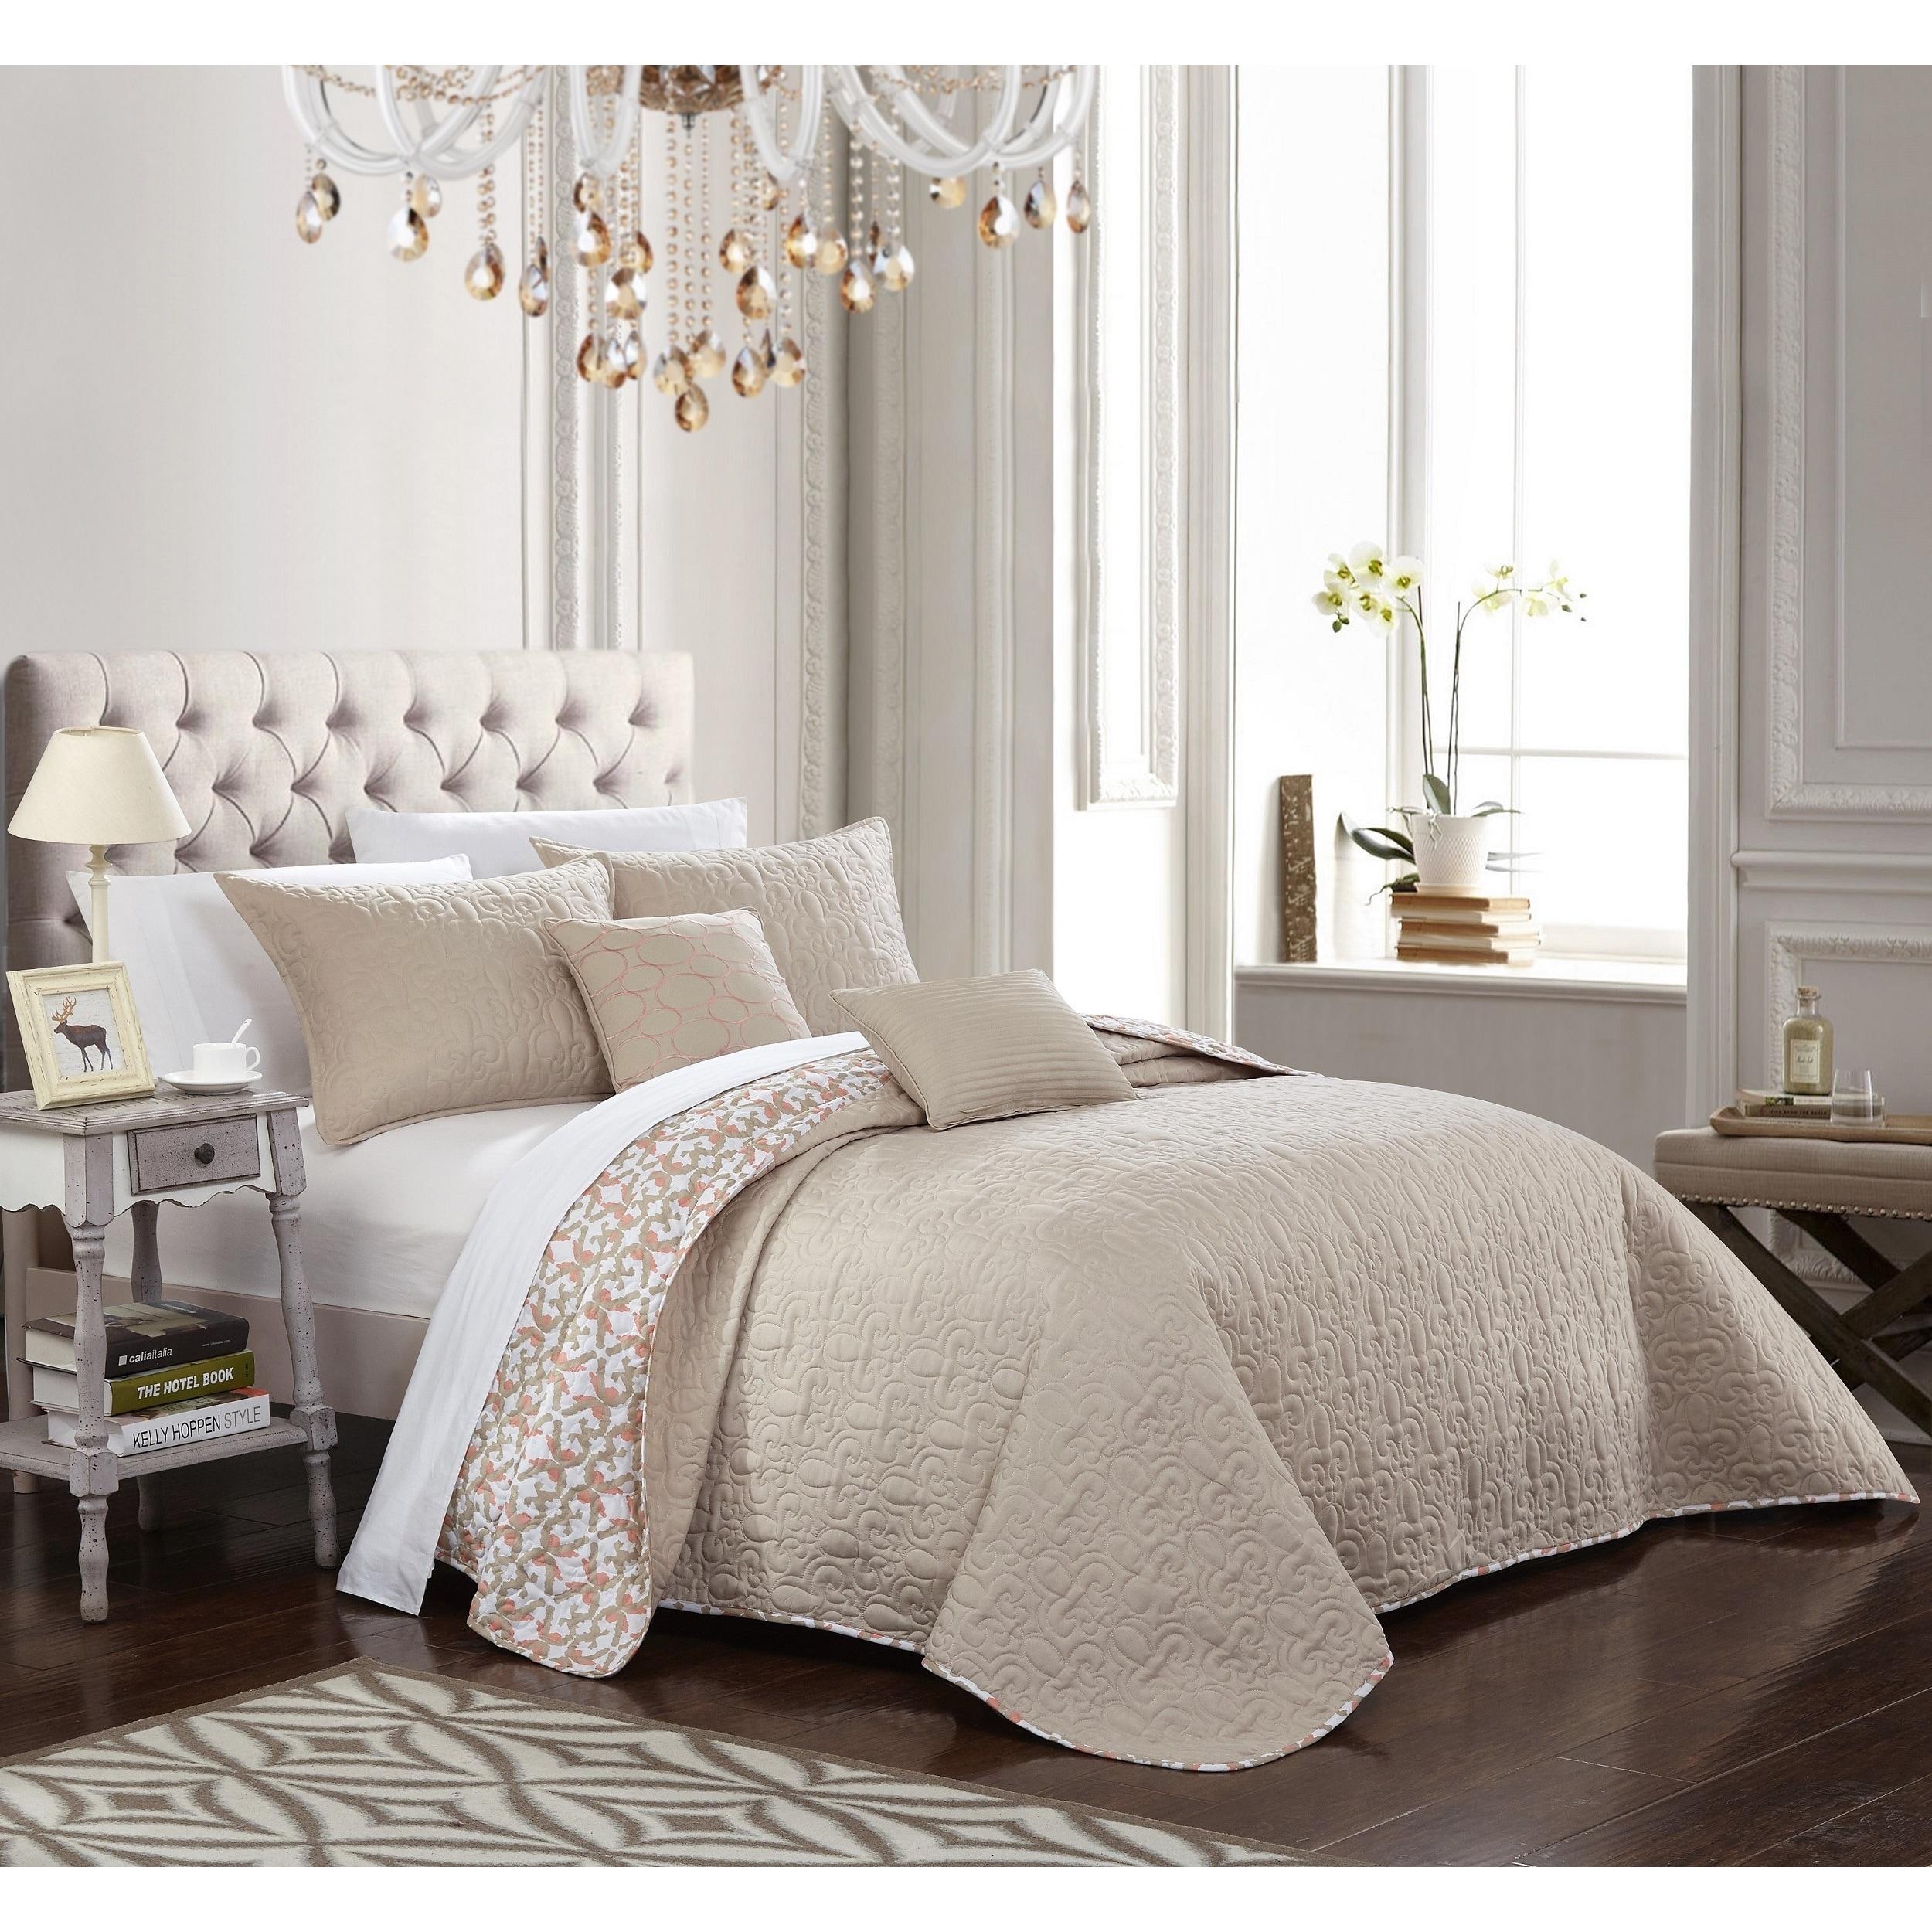 allen robert save in sets bedding de lis merlot windsor fleur collection comforter set